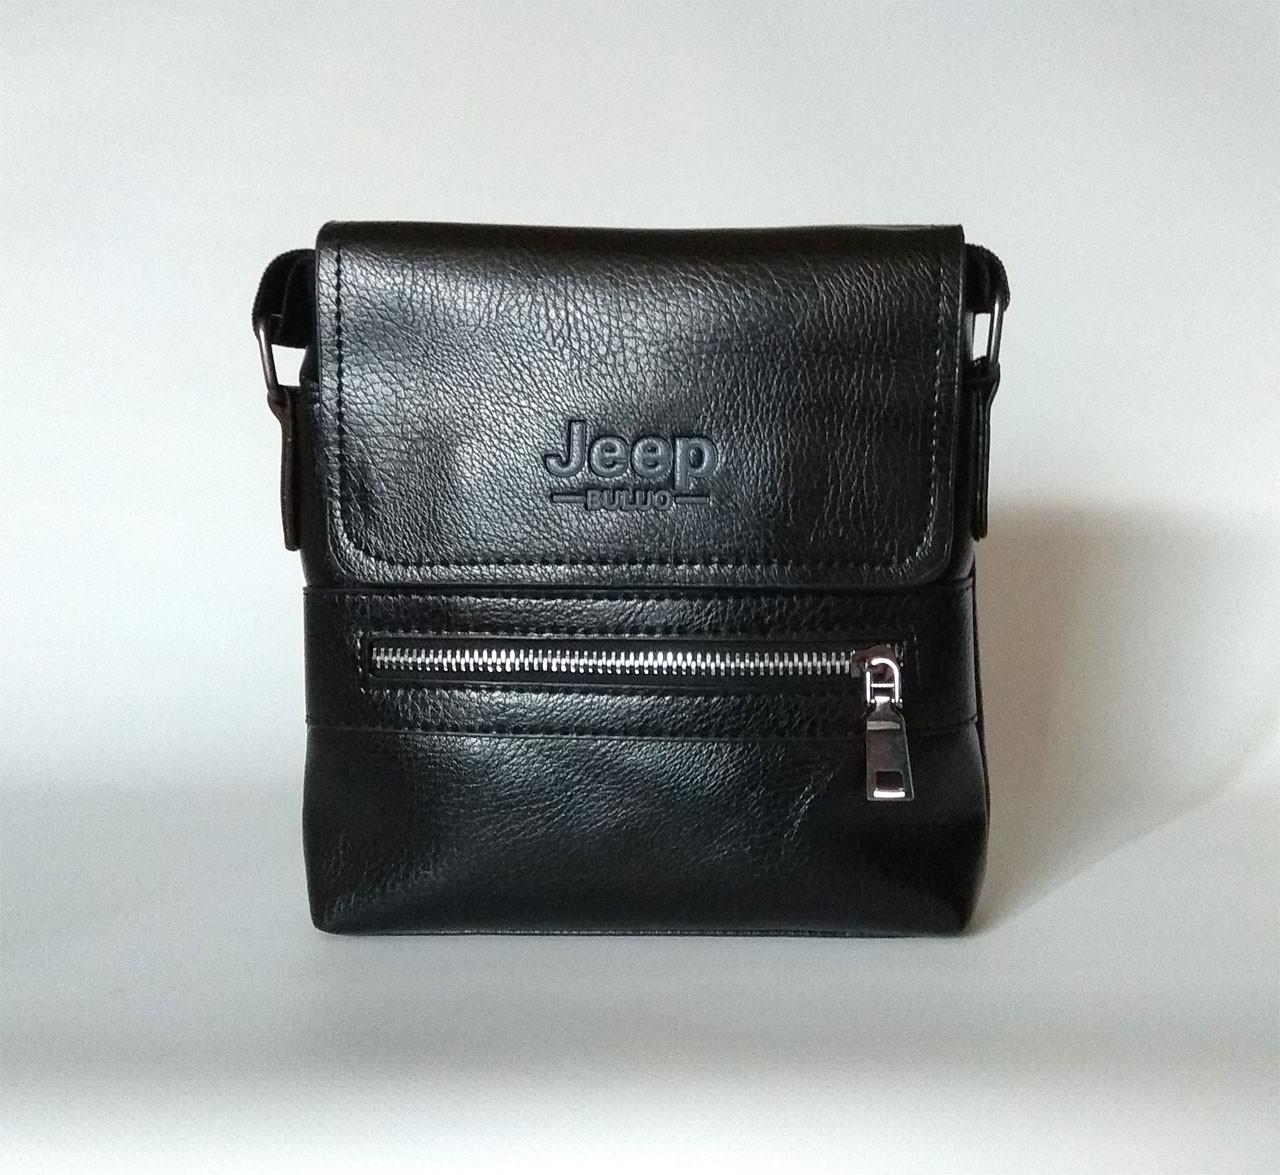 Мужская сумка через плечо Jeep. Черная. 21см х 19см / Кожа PU. 558 black